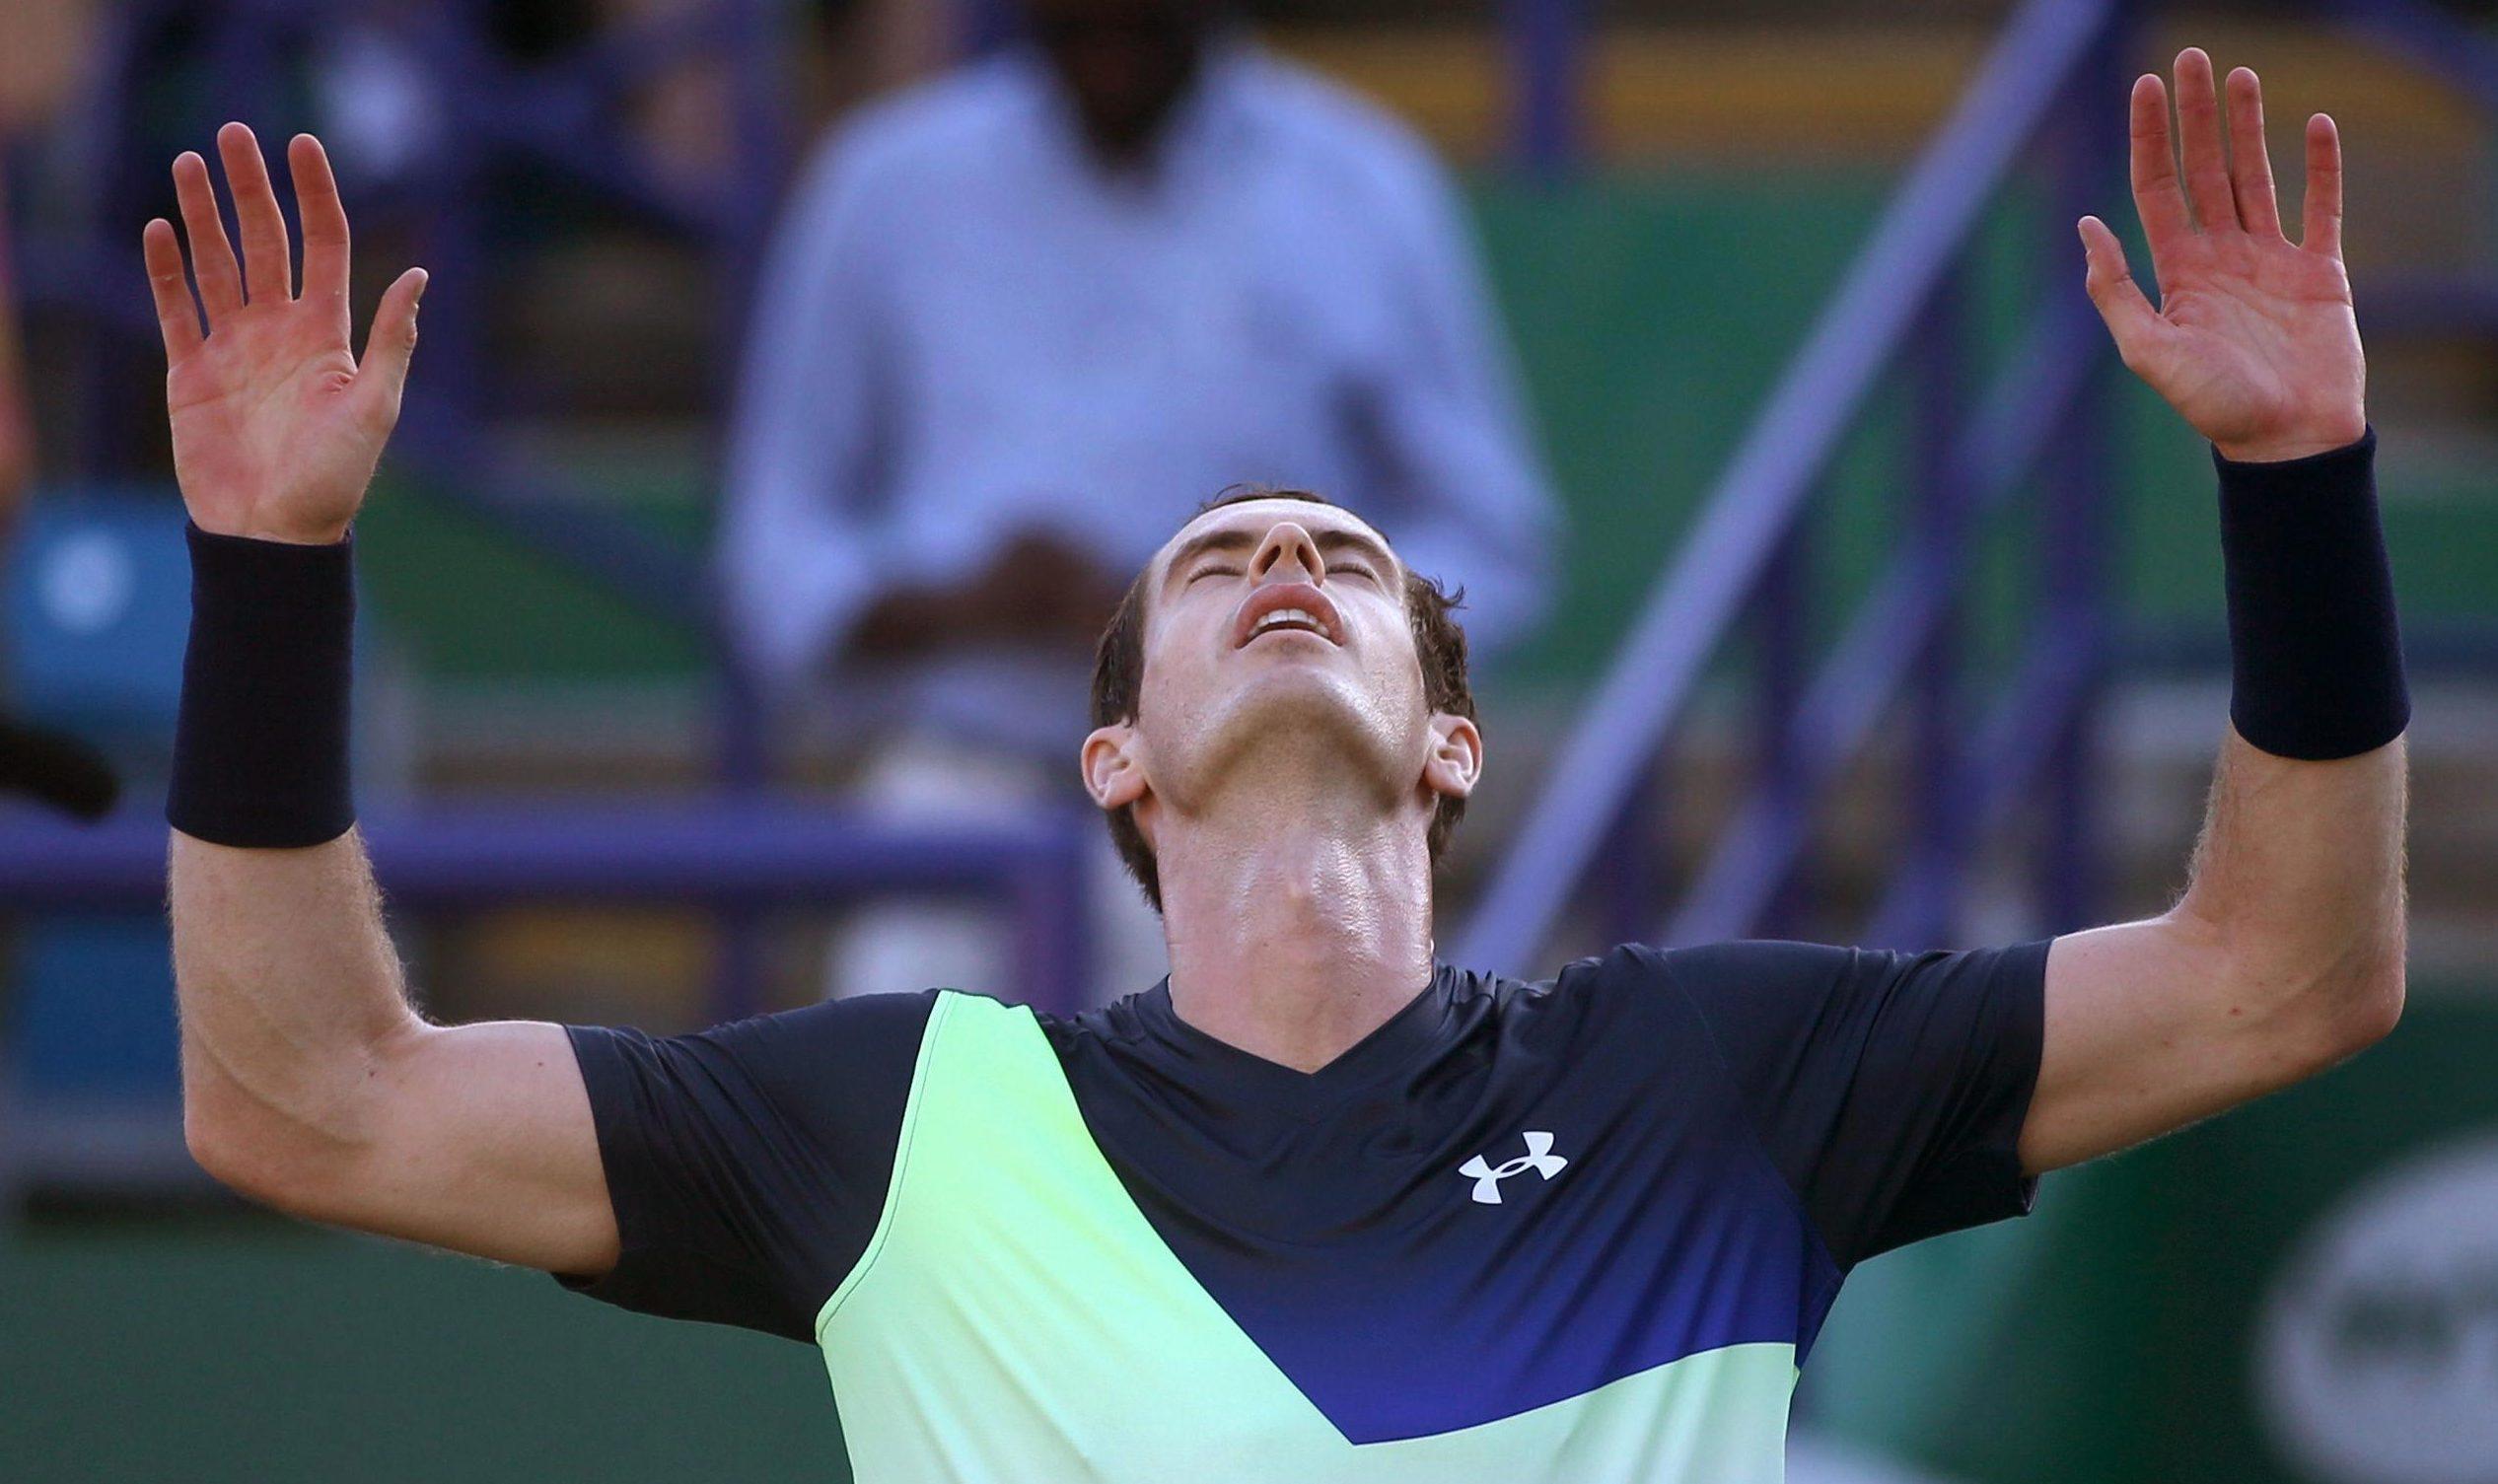 Former world No 1 Andy Murray savours the moment as he beats Stan Wawrinka